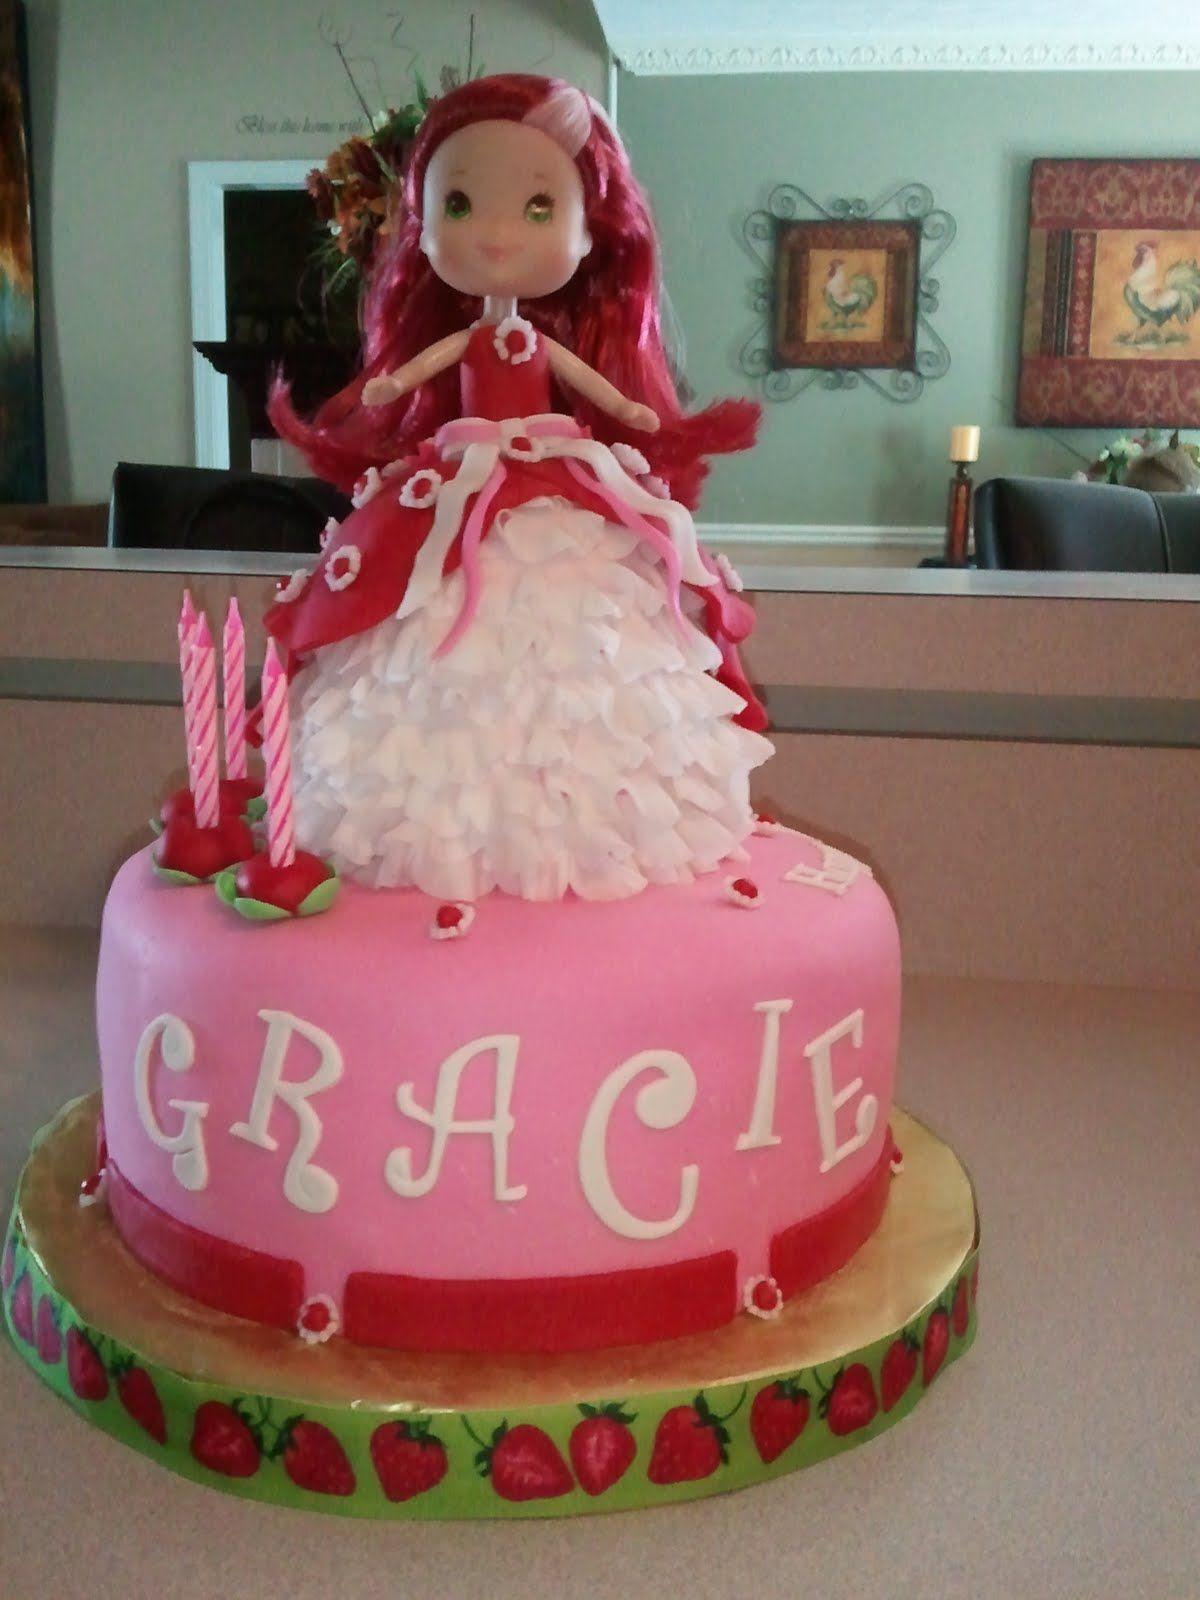 Strawberry Shortcake cake with ruffles